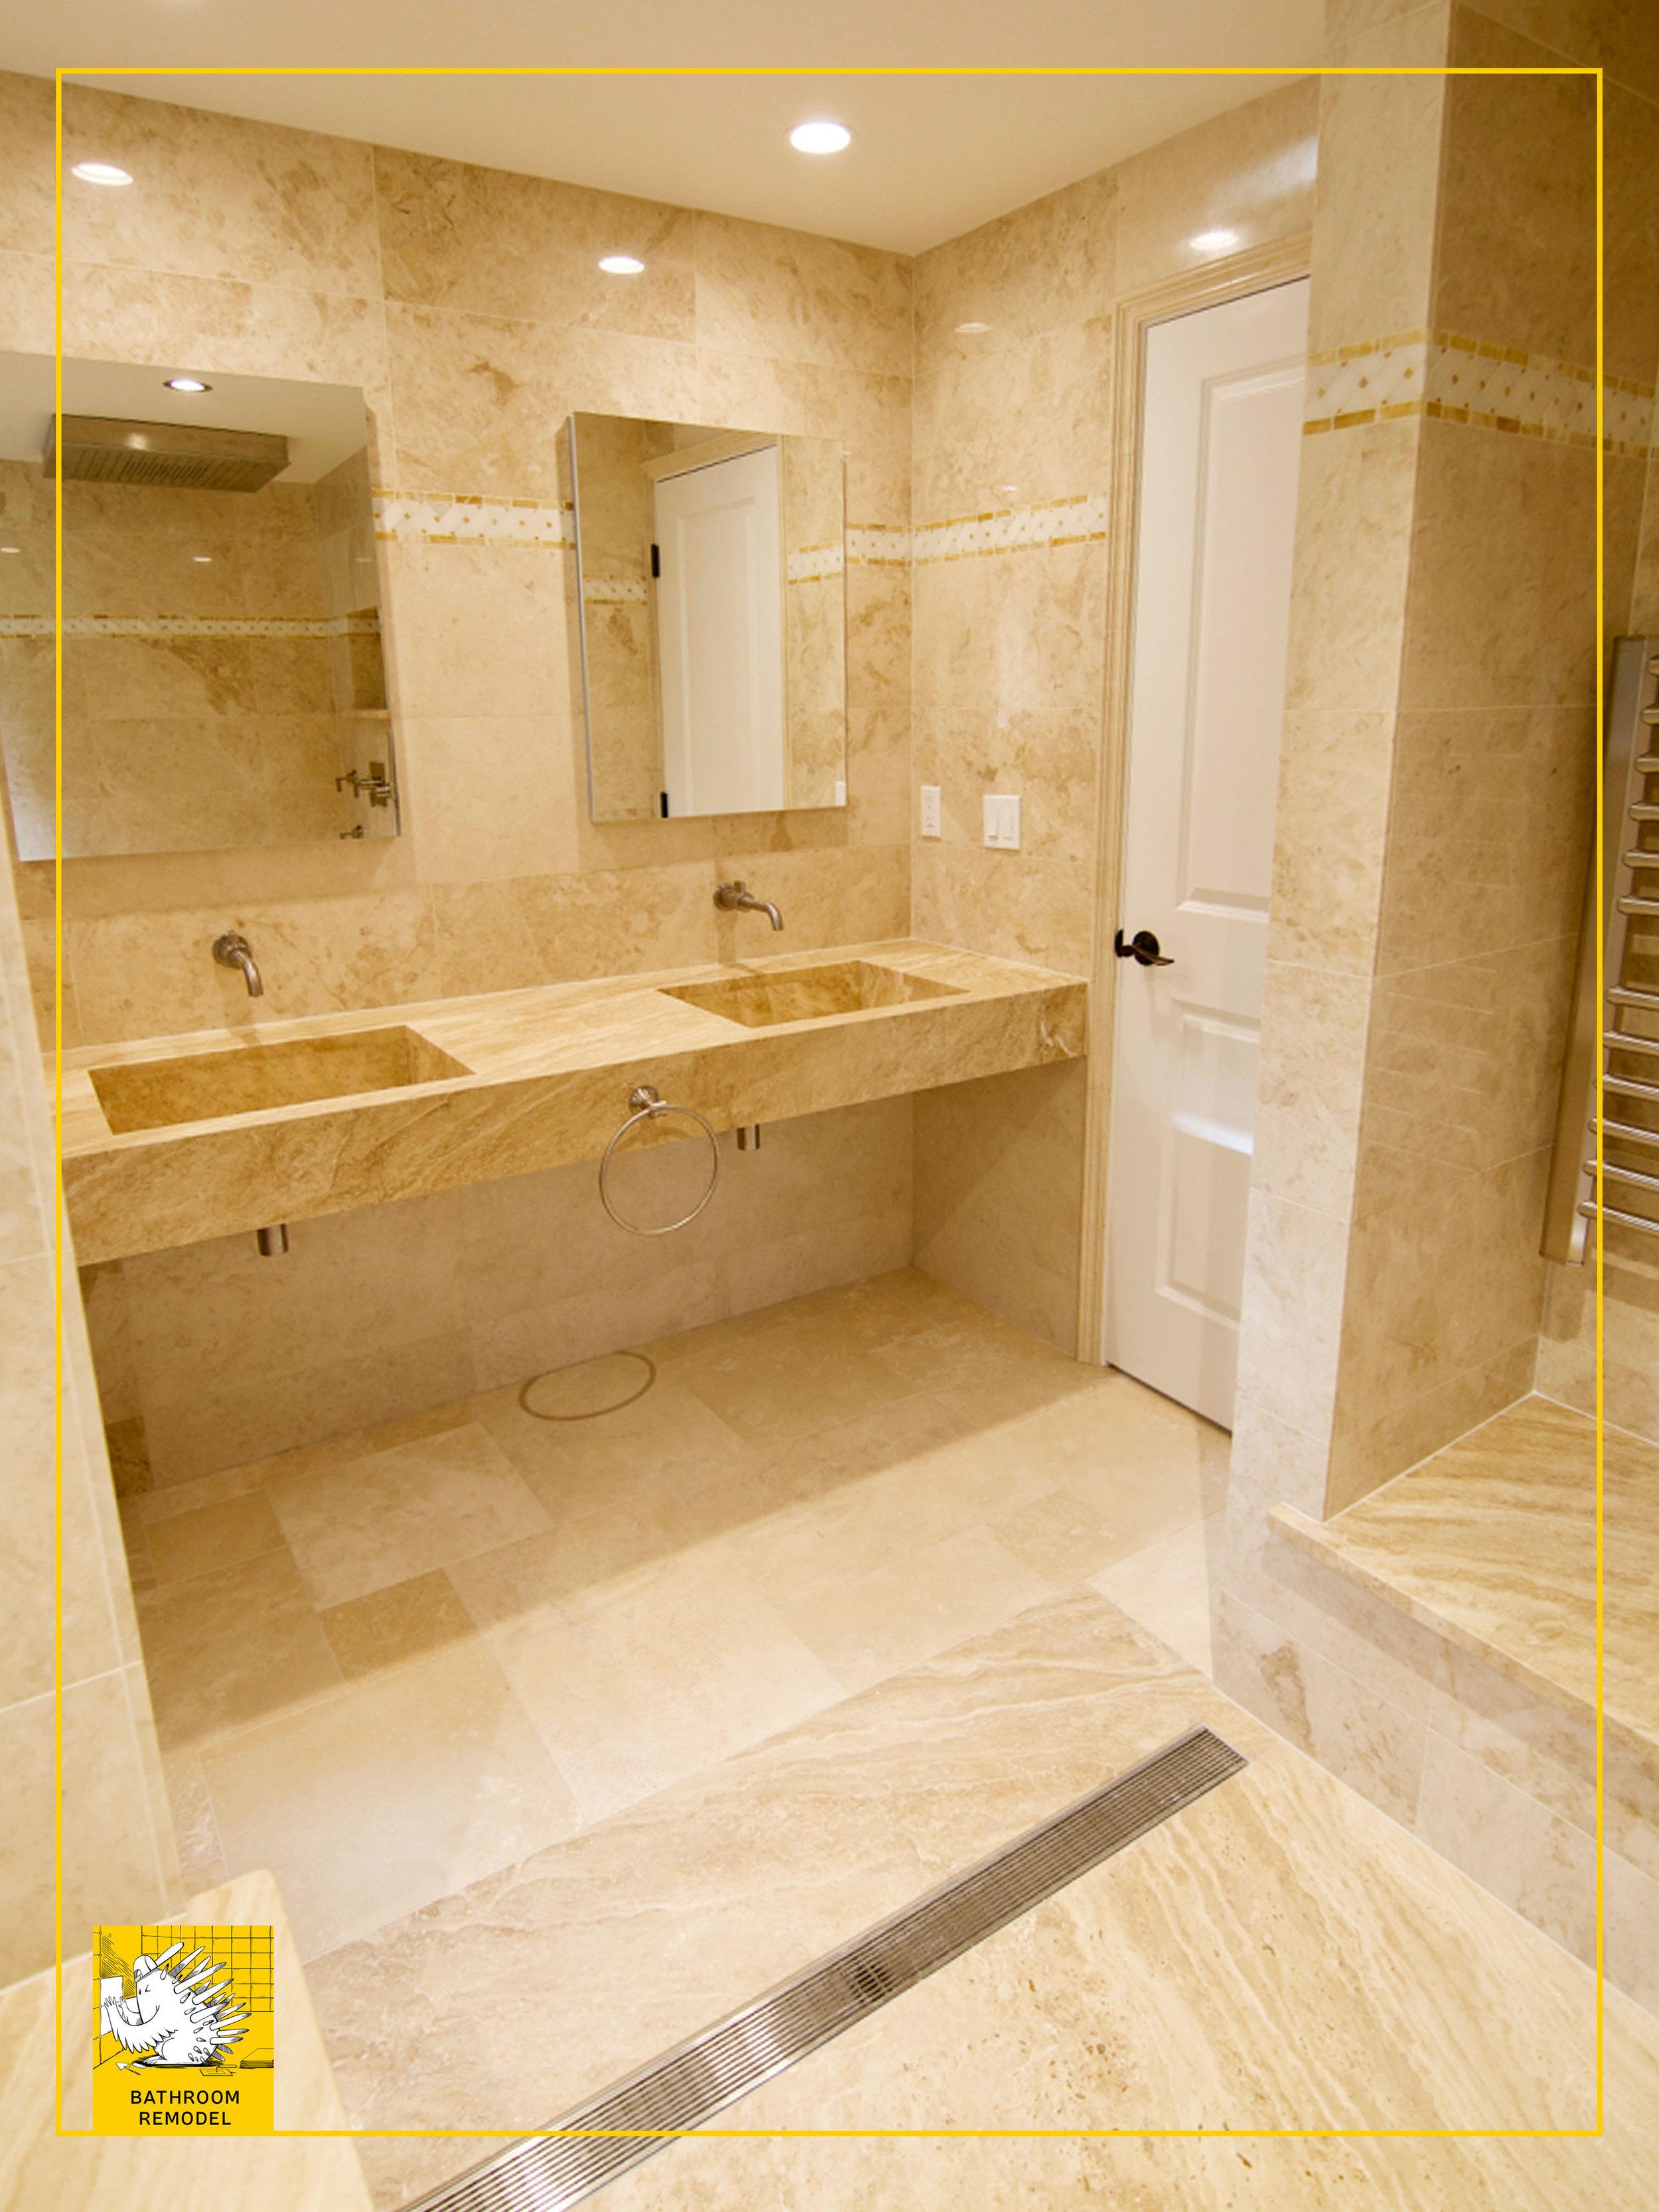 MT bathroom 5 after 6.jpg